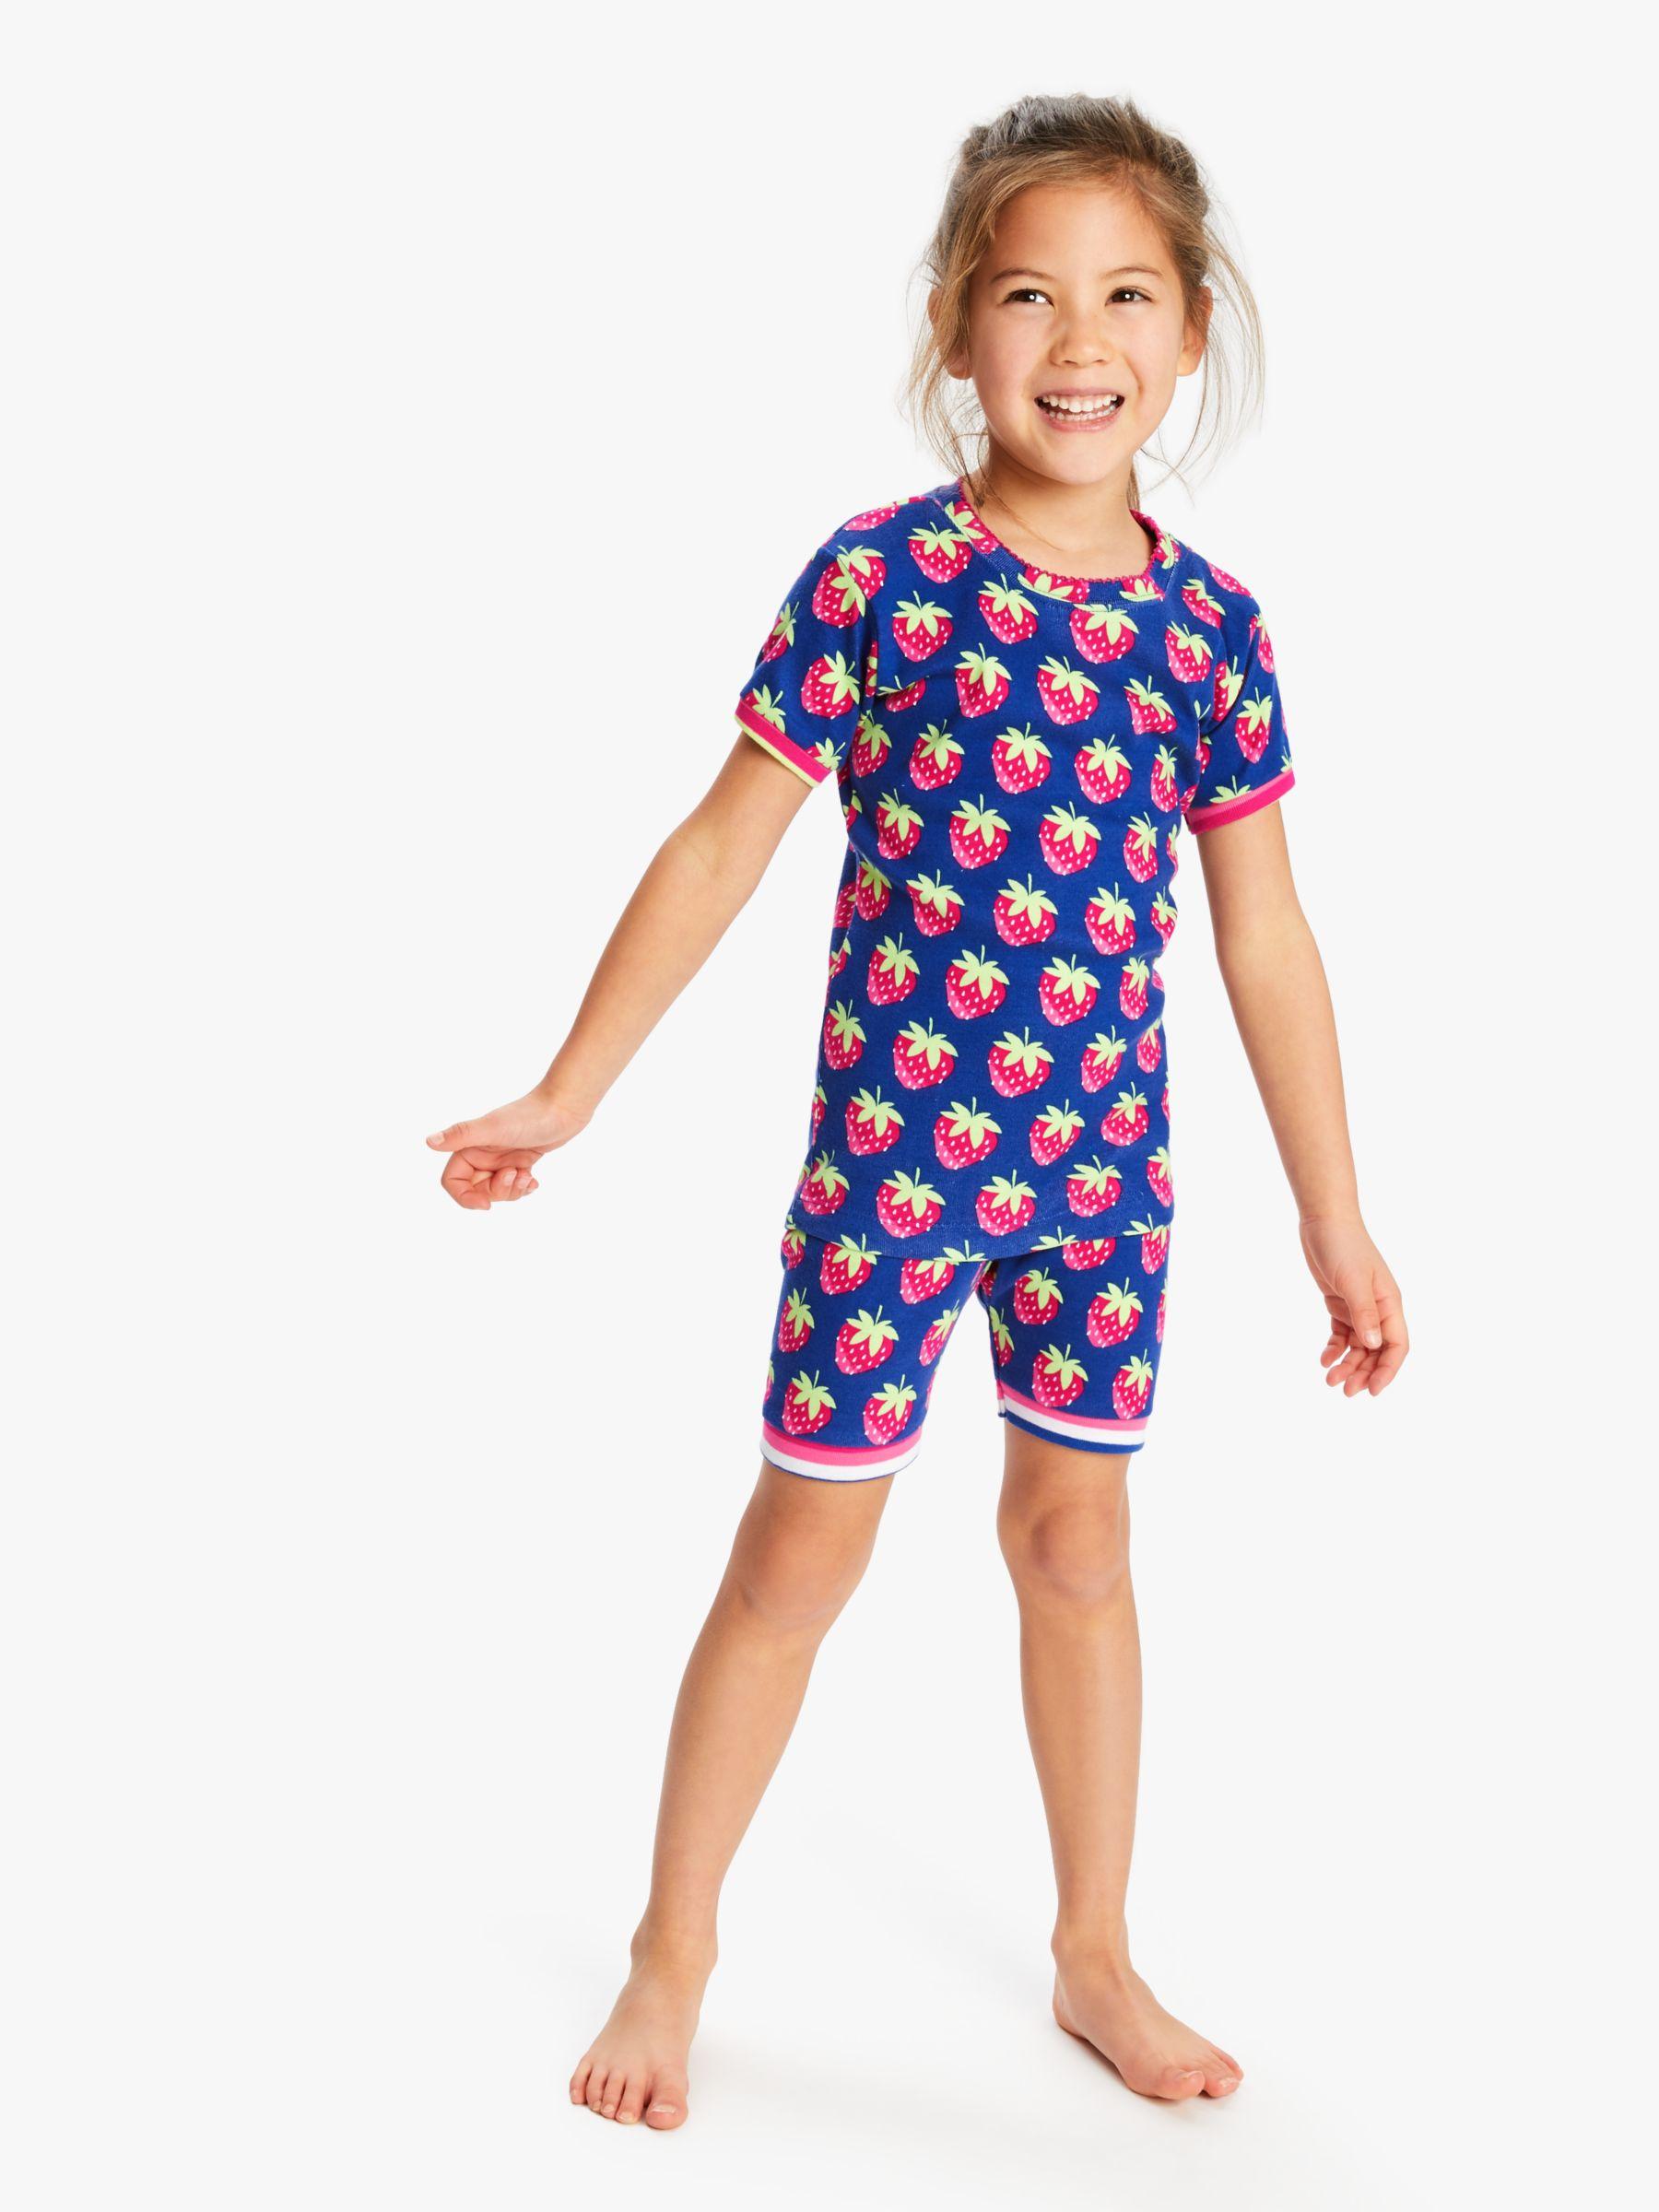 Hatley Hatley Girls' Strawberry Print Short Pyjamas, Blue